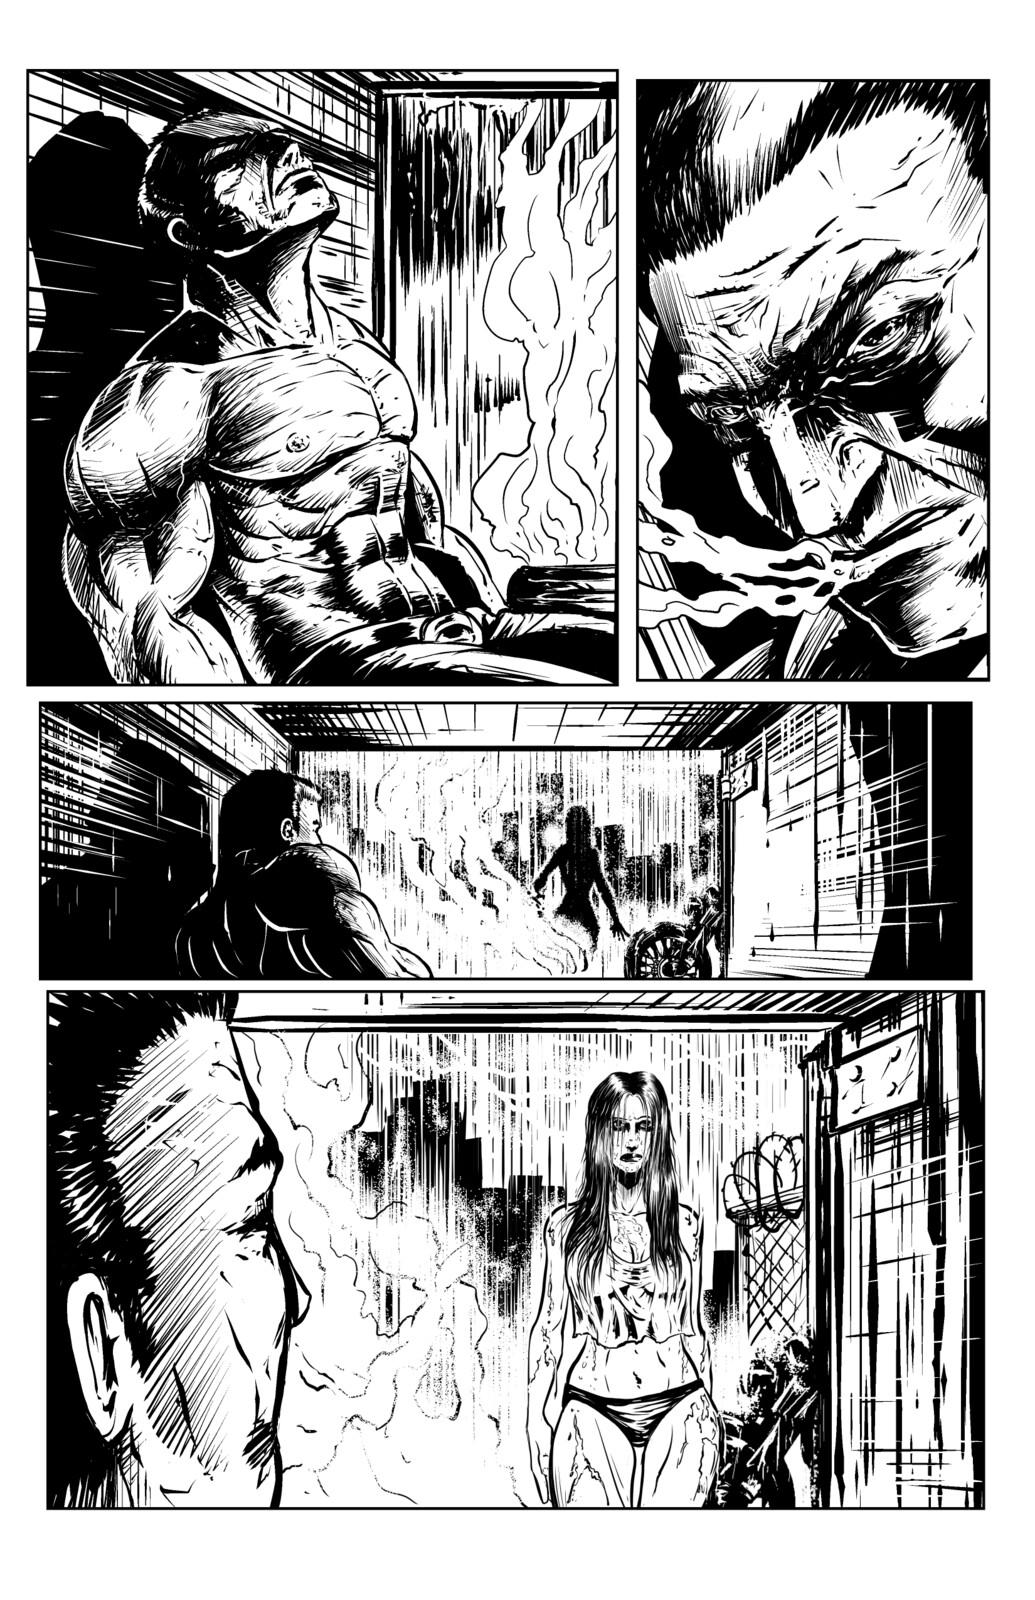 Johnny Saturn: Spiral City Noir, pg4